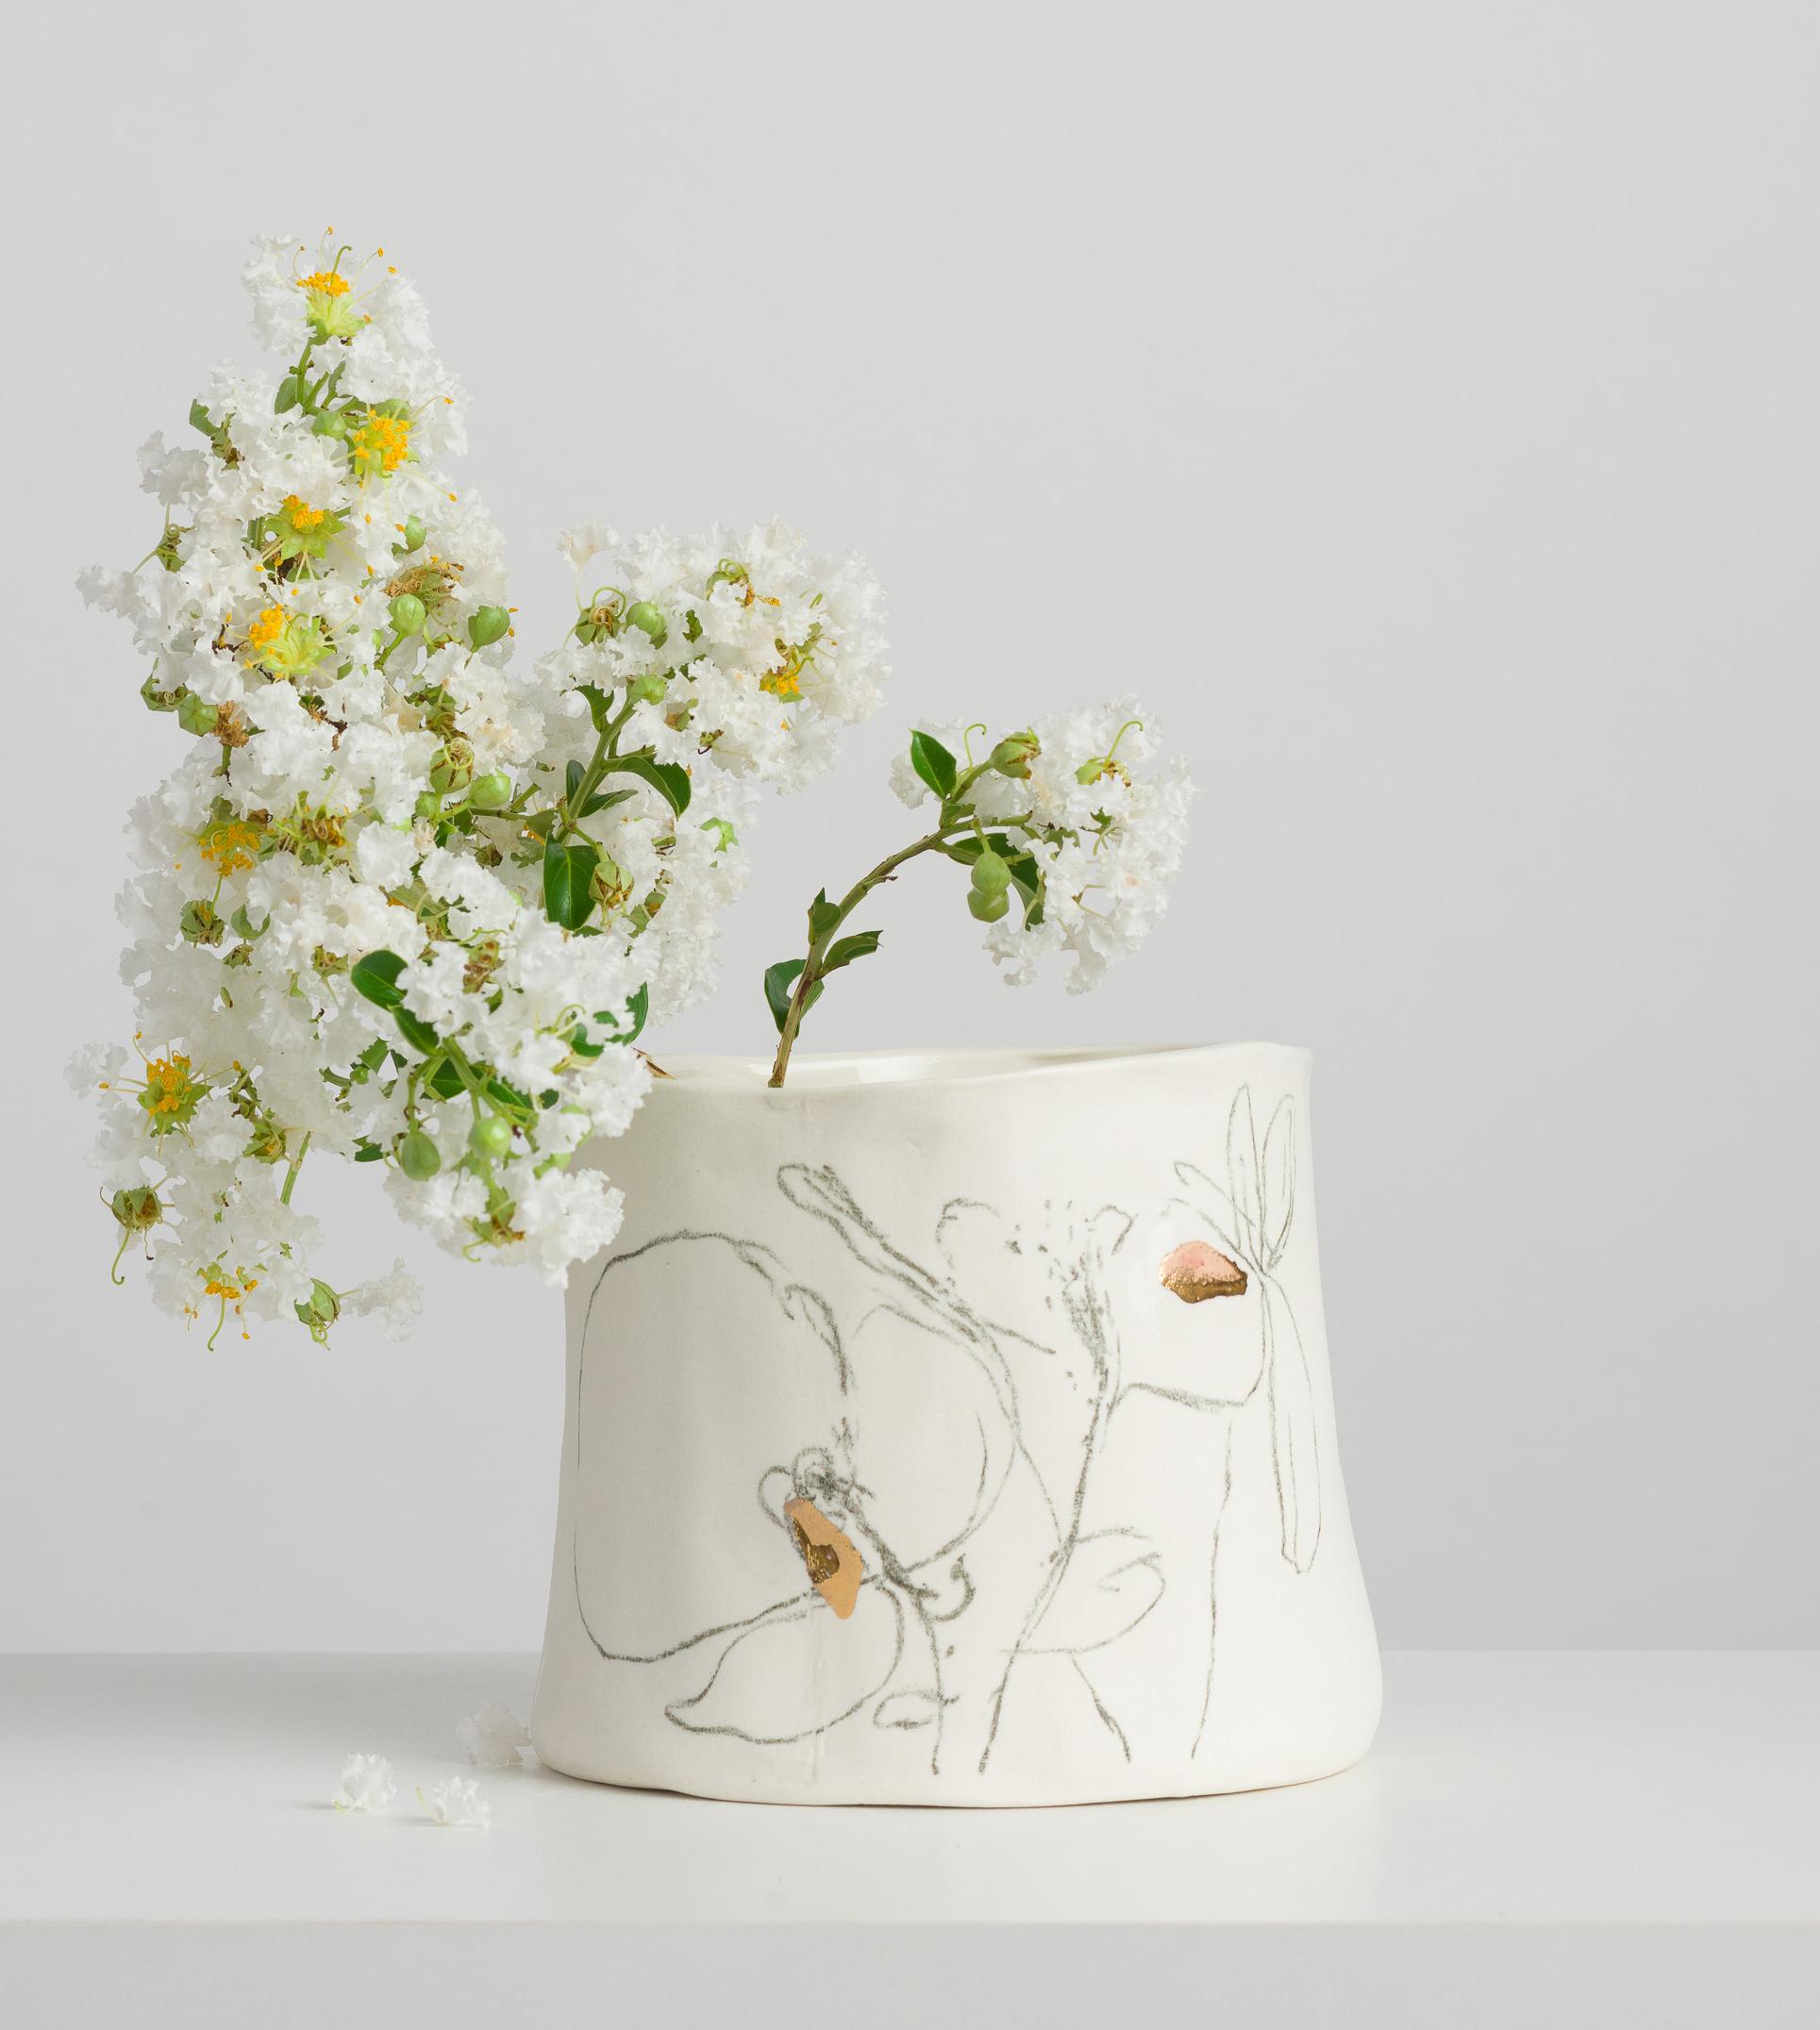 Vaso único da série Botânica do Atelier Le Motif.